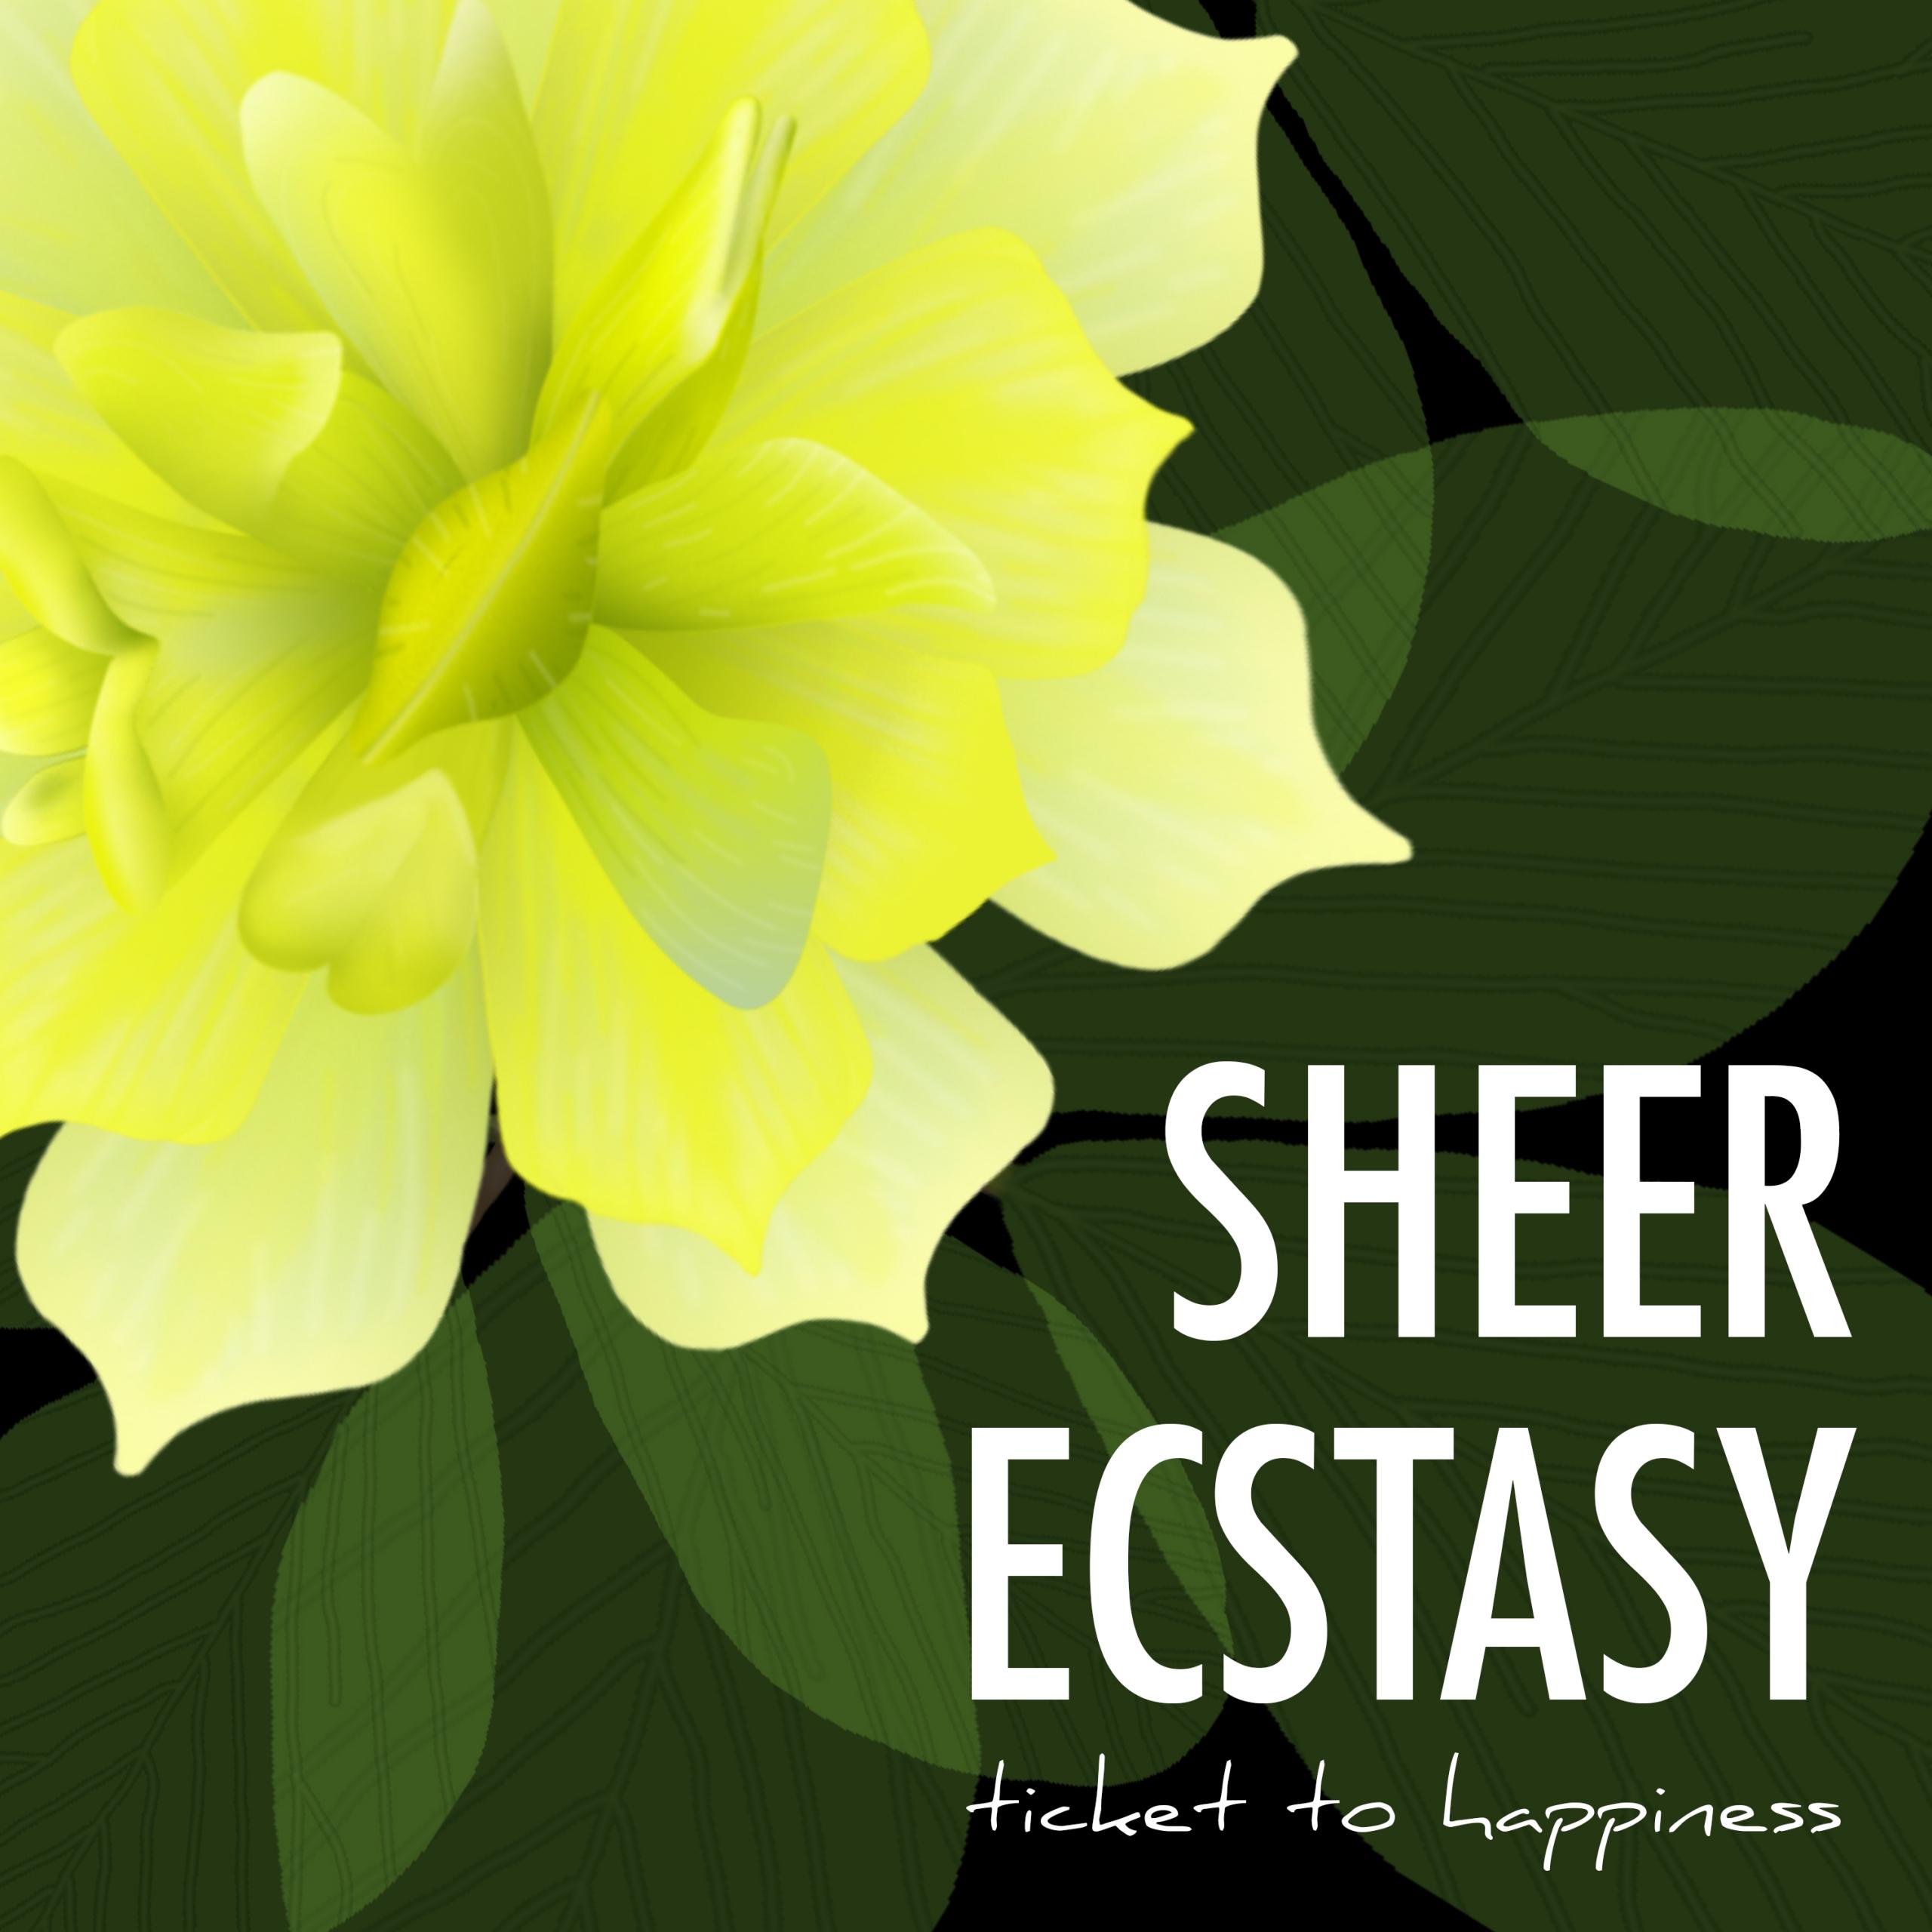 Sheer Ecstacy - Cover - Ticket to Happiness - Single - Folk - Folk Rock - Folk Pop - Music - MP3 Download